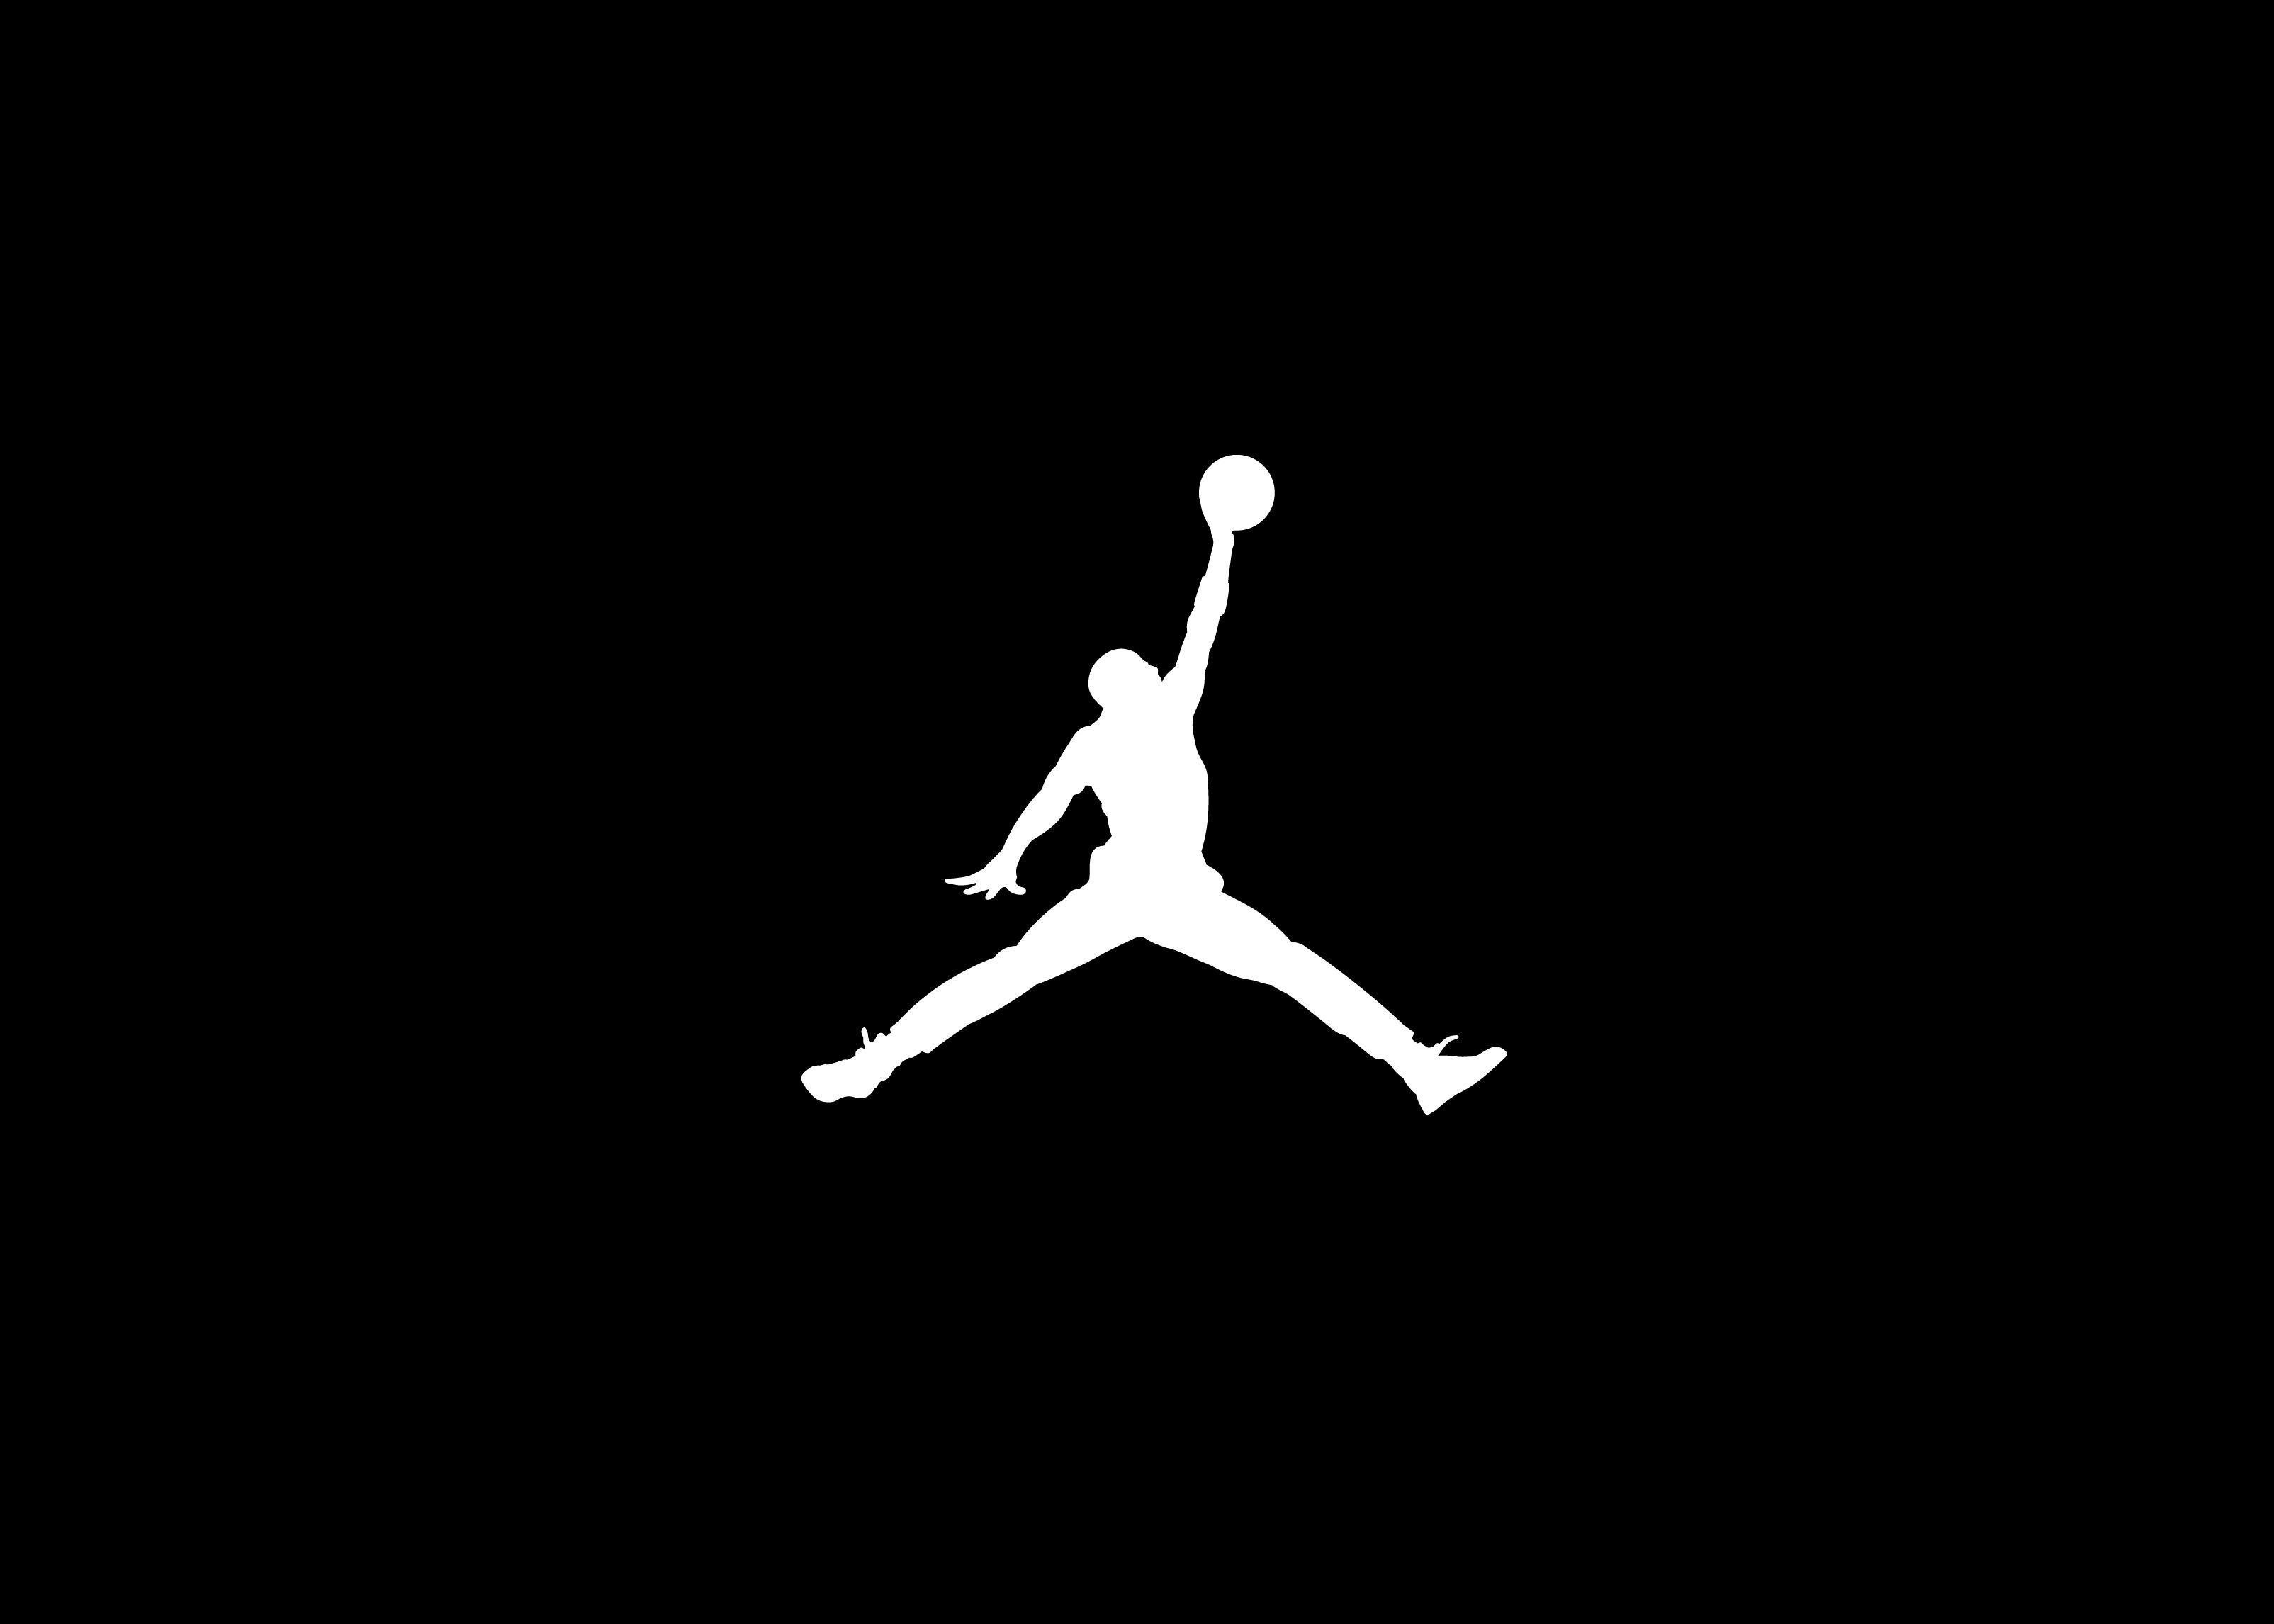 3d air jordan logo backgrounds epic bright